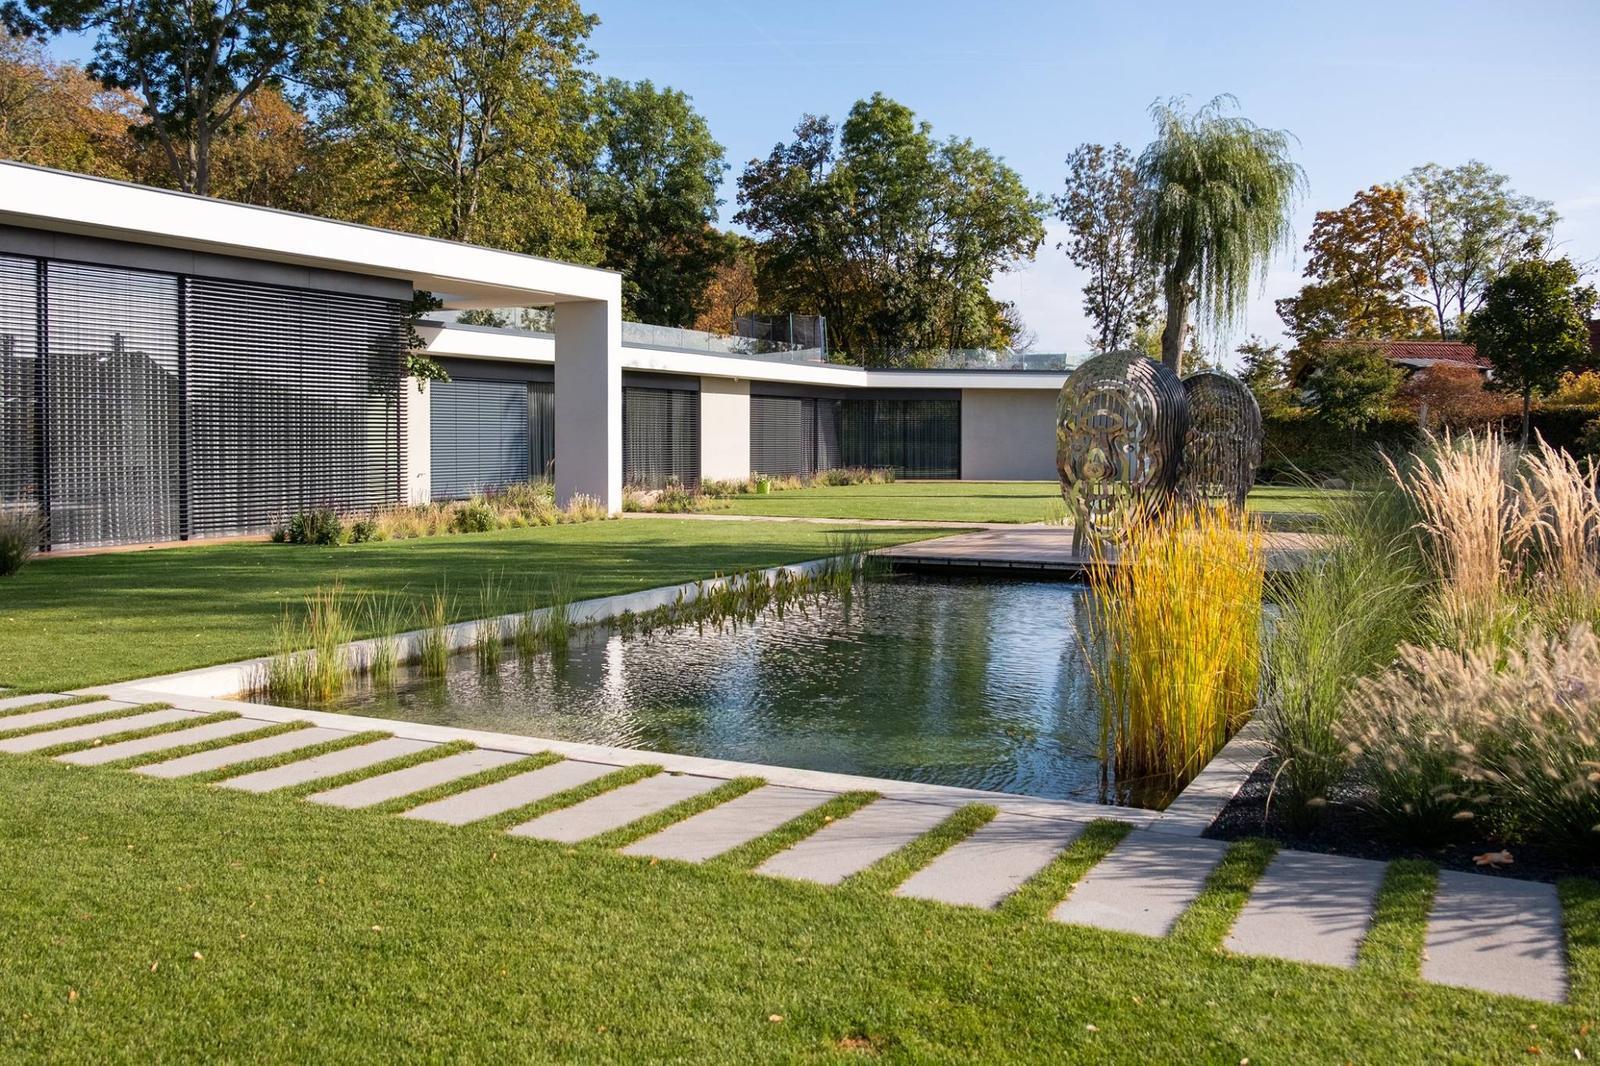 Ferdinandove záhrady - inspirace z Atelieru Flera